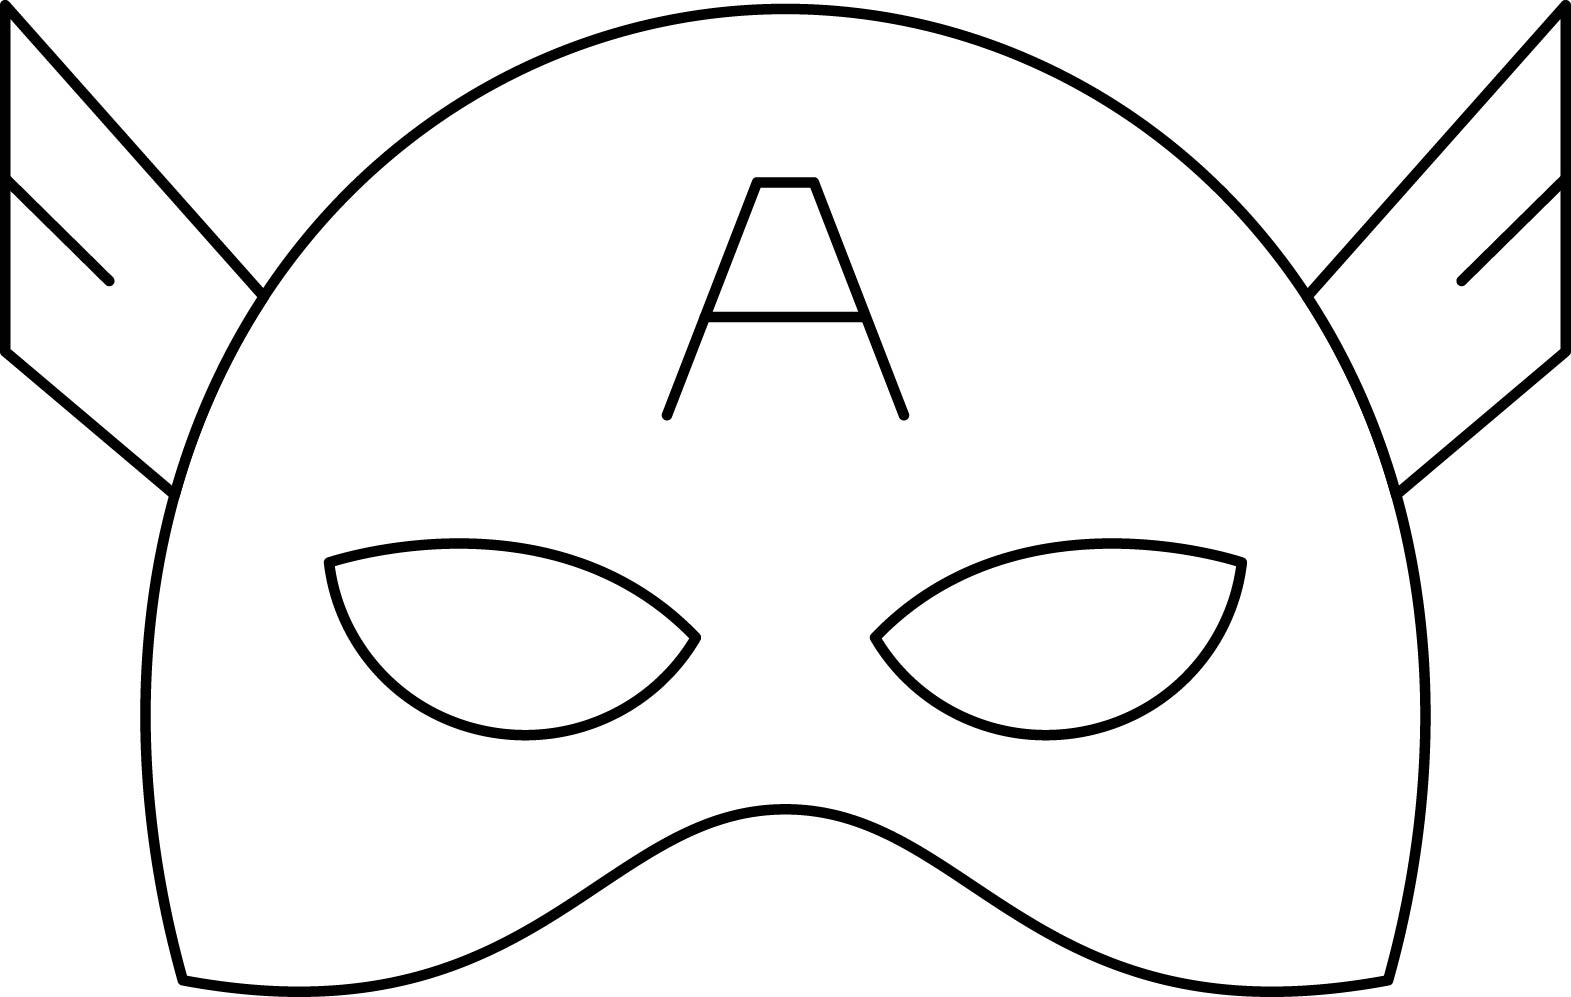 Superheroes Super Hero Mask Coloring Page 03 Captain America